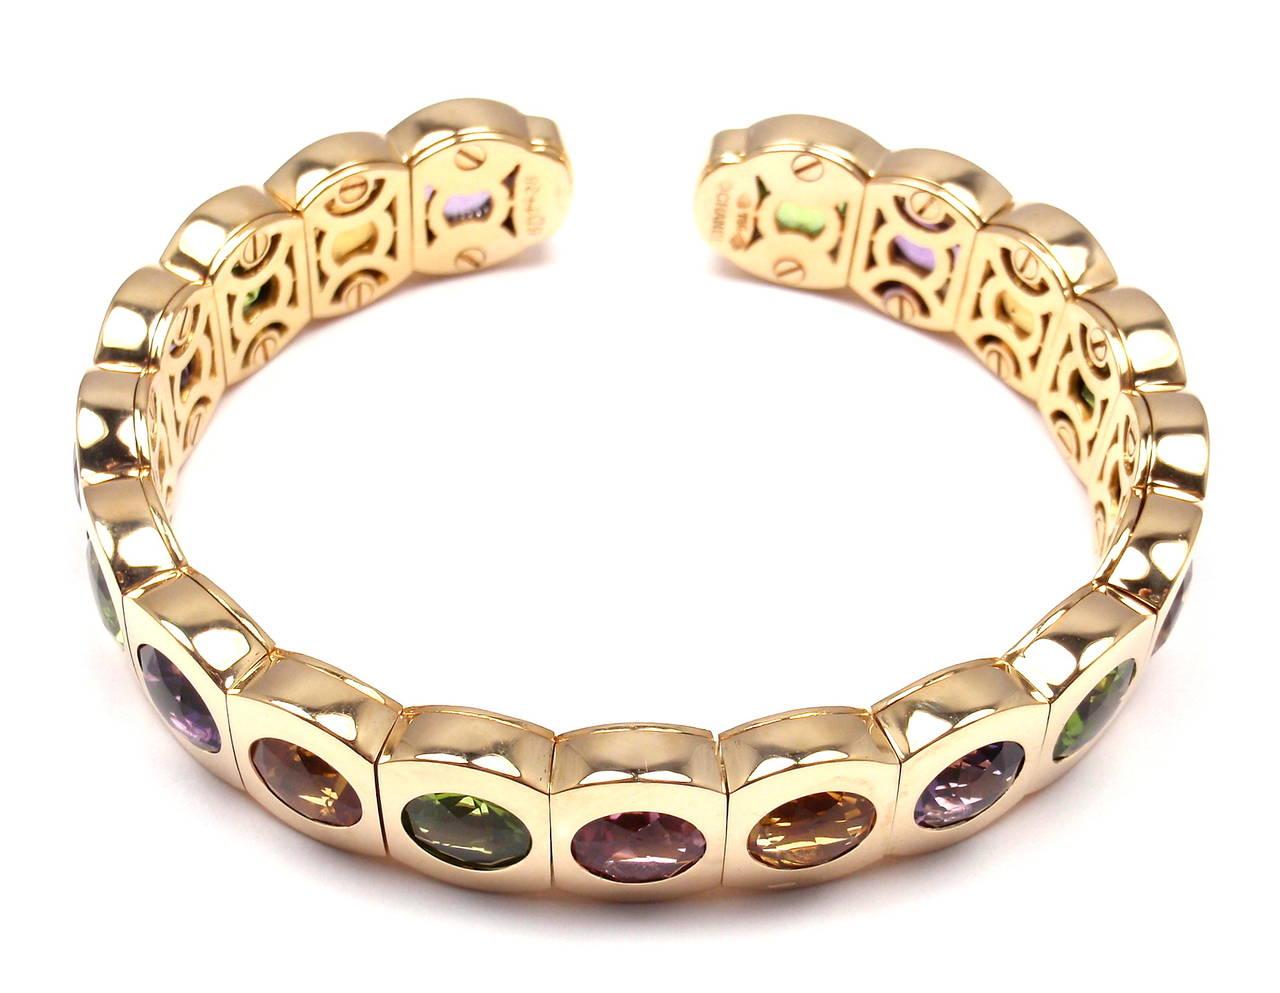 Chanel Multi Color Stone Yellow Gold Cuff Bangle Bracelet 2